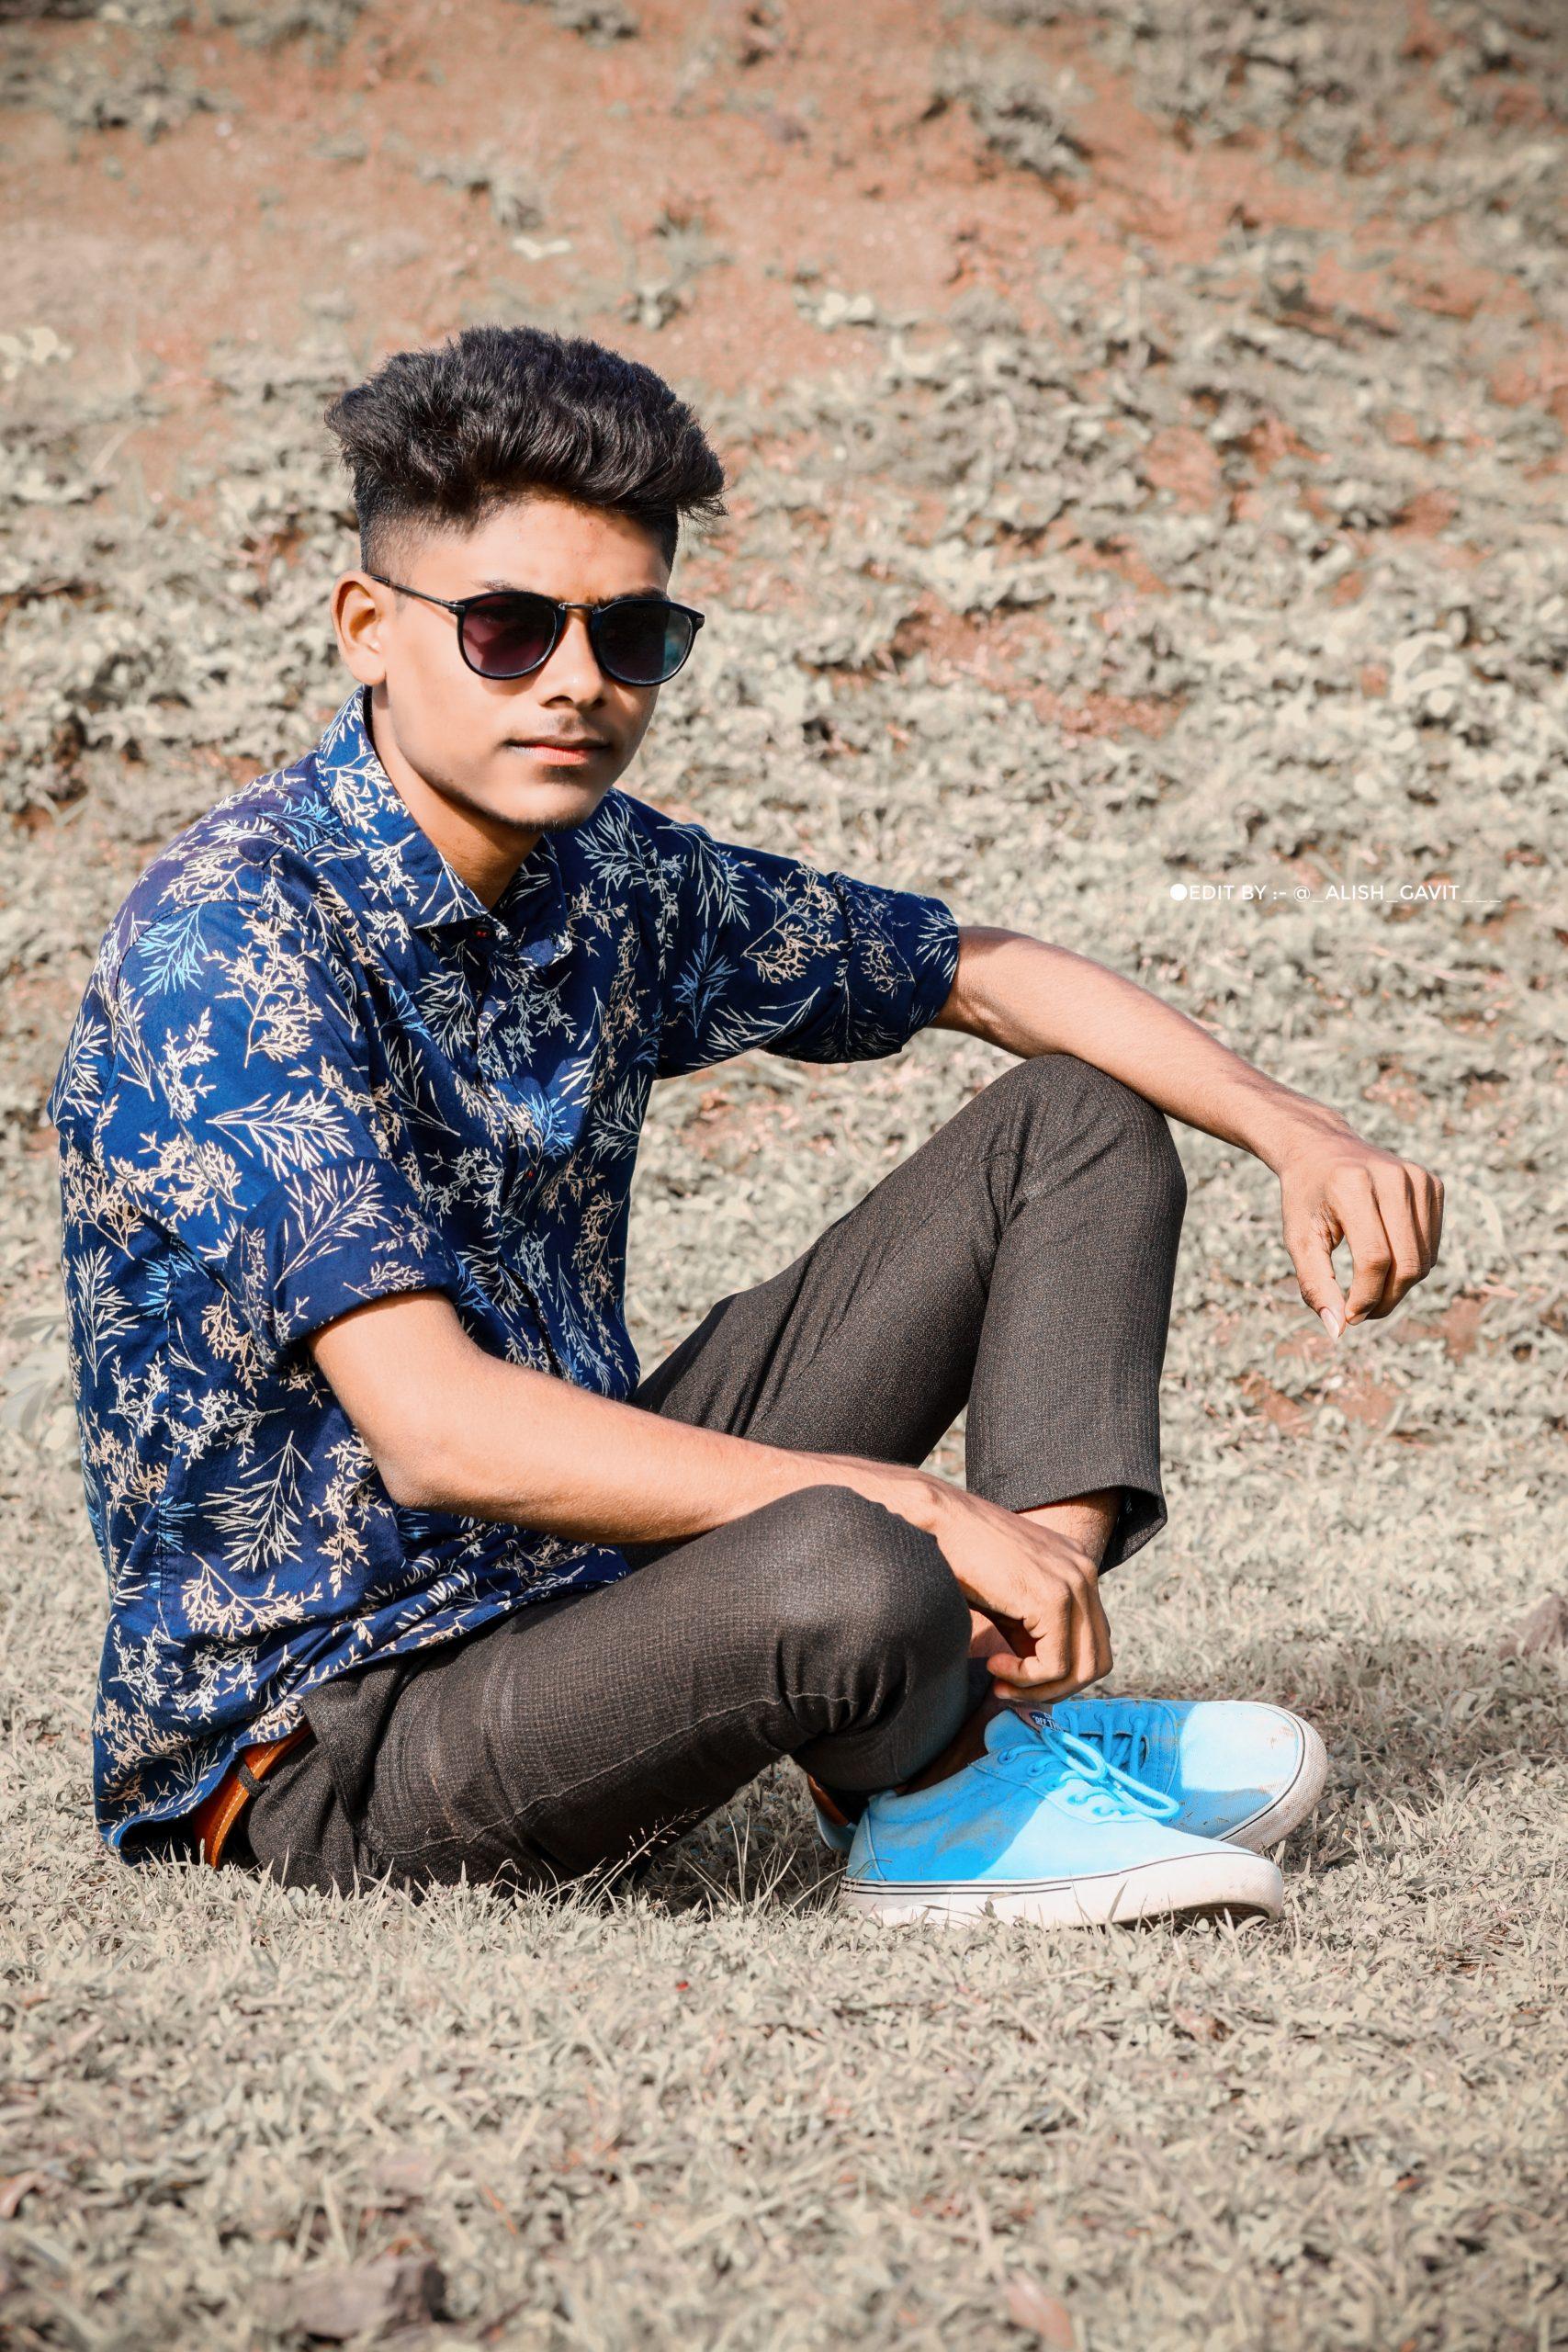 Stylish boy sitting on the floor and posing